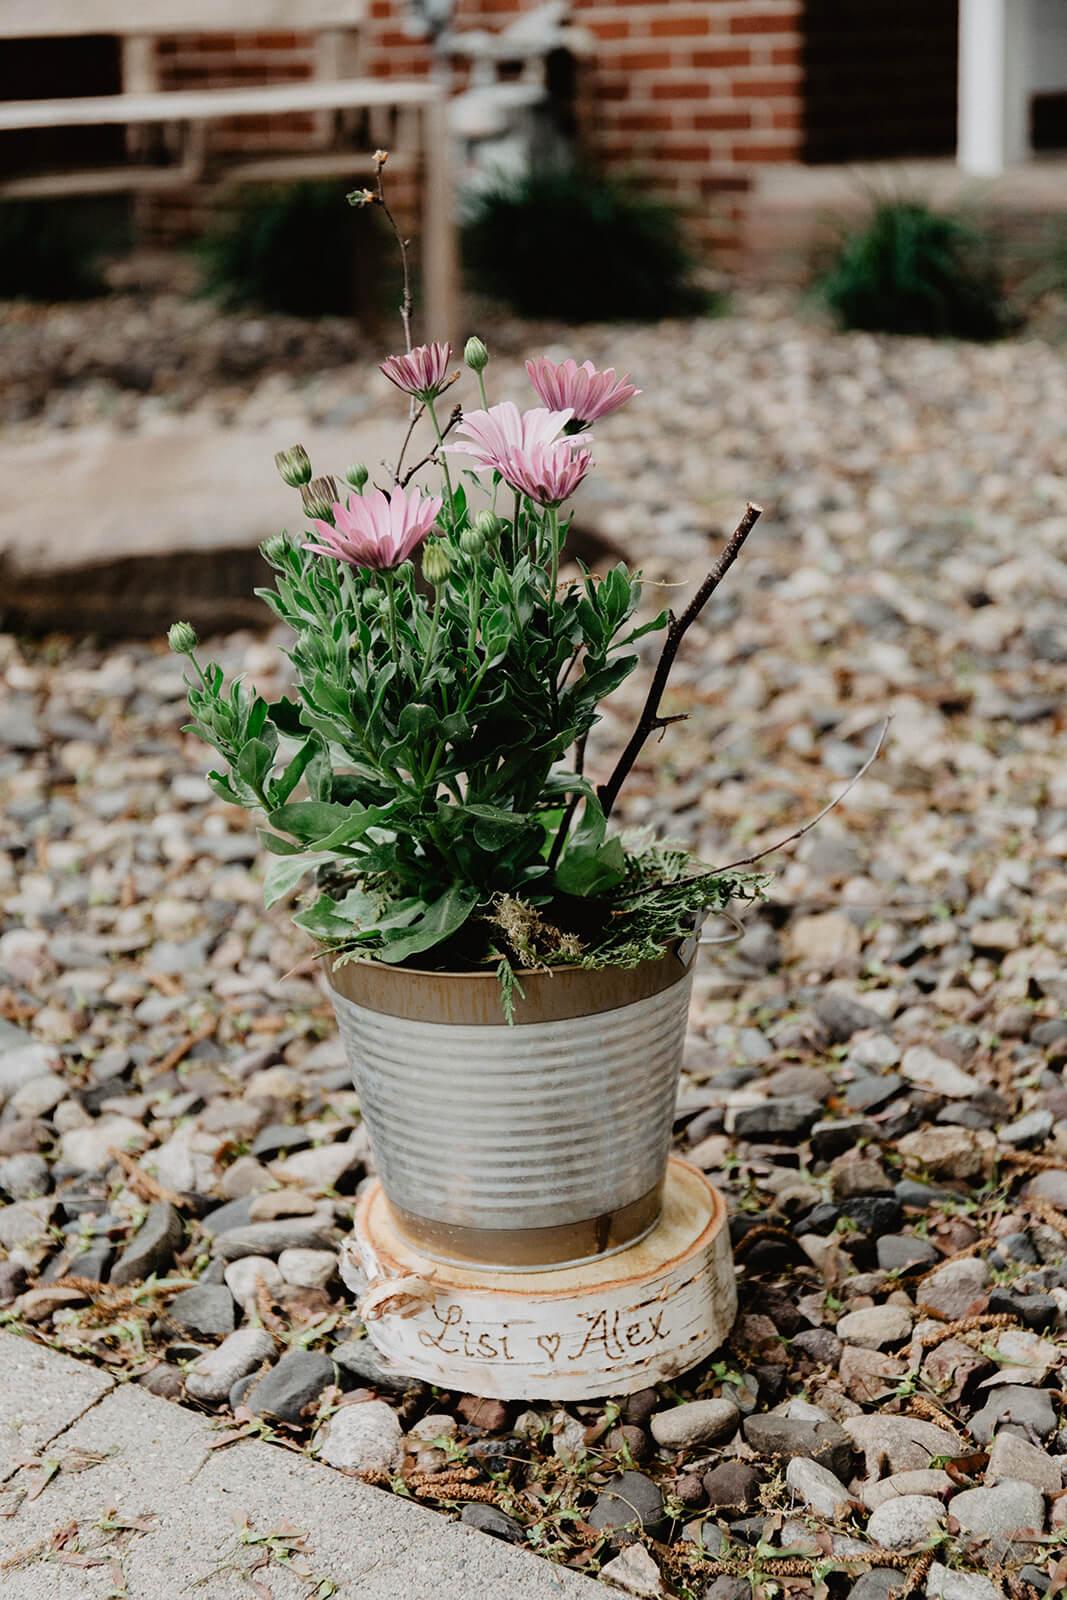 Alex + Lisi -- backyard Minnesota wedding -- Mads Lizotte photography -- Sixpence Events -- potted floral arrangements.jpg